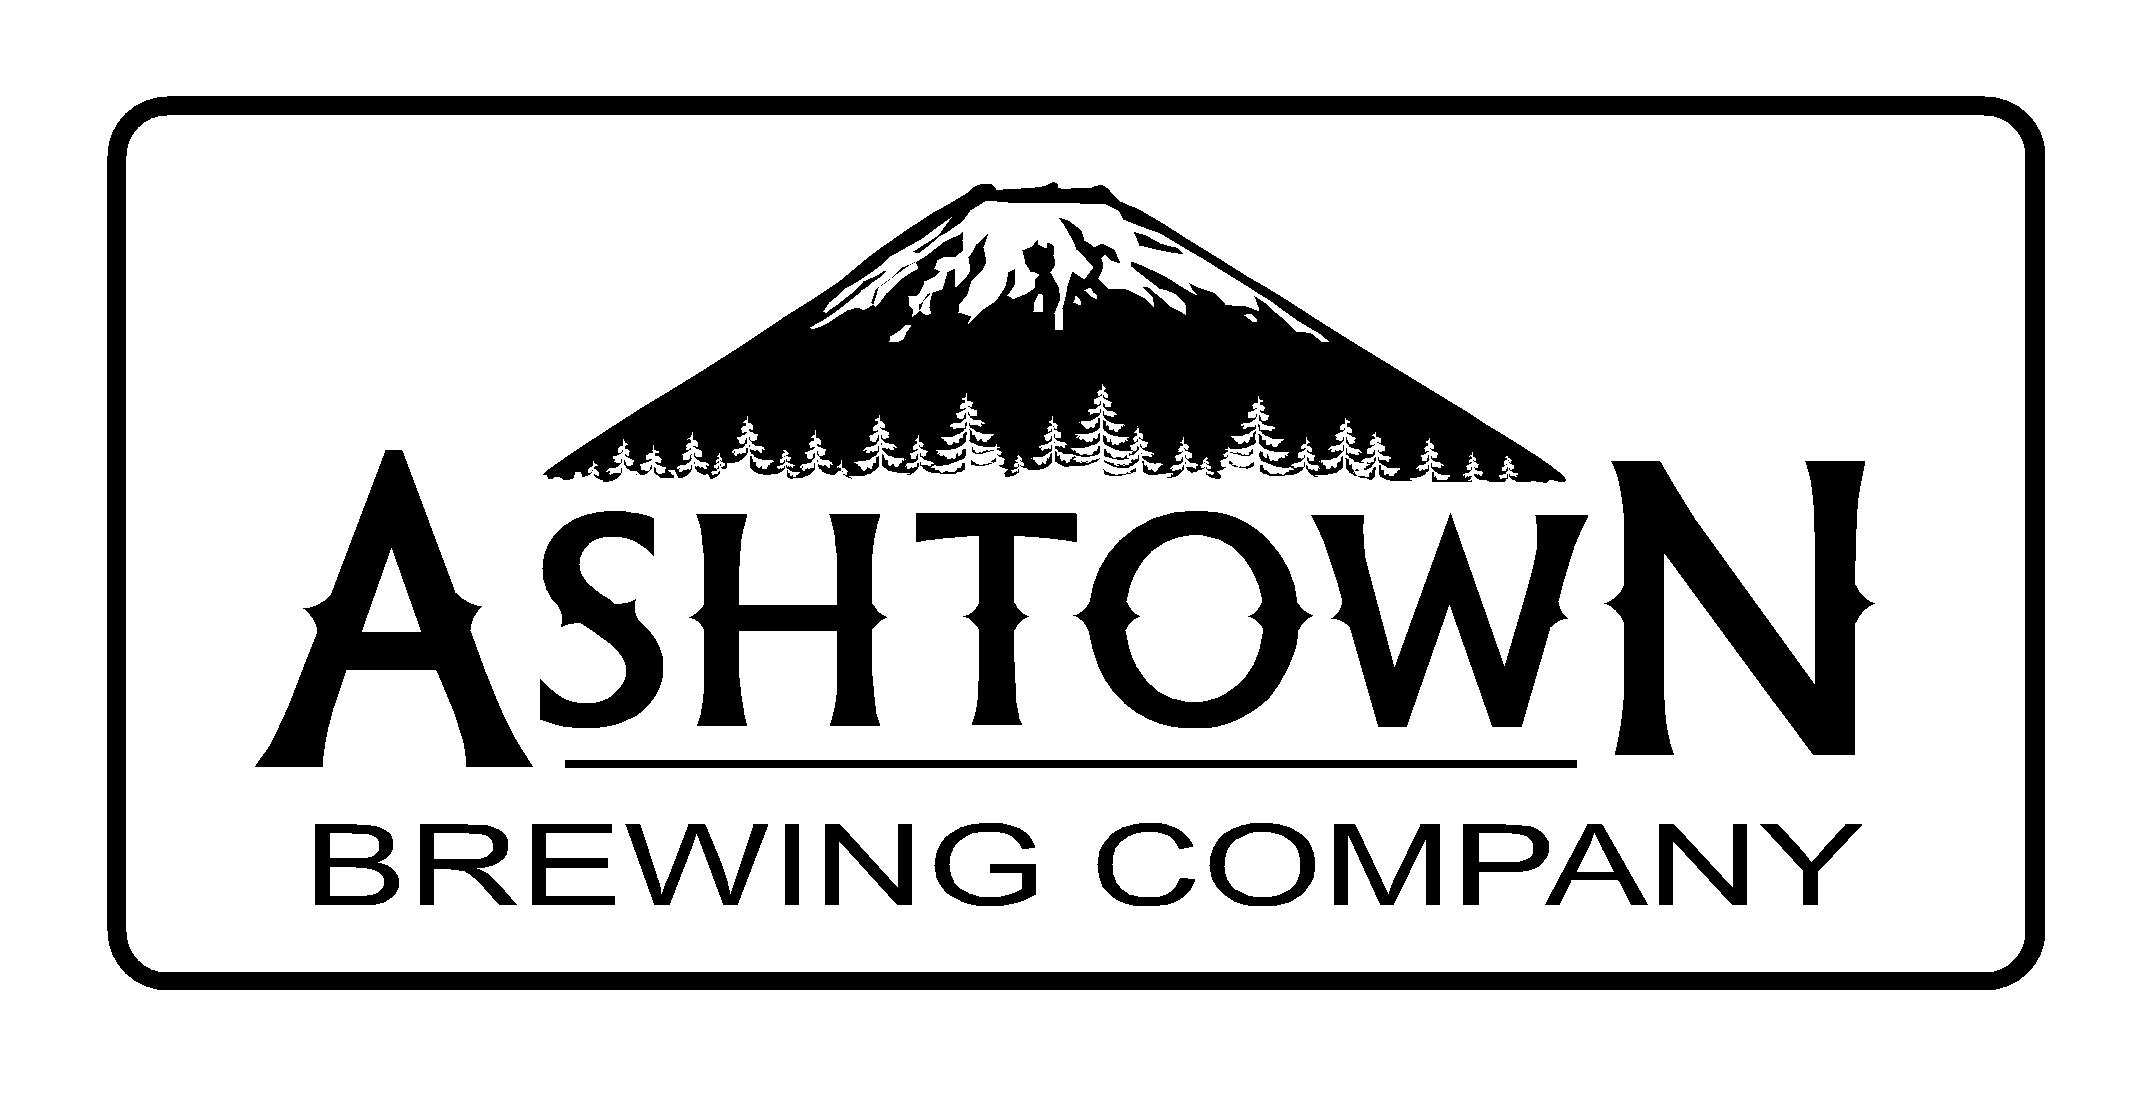 Ashtown Brewing